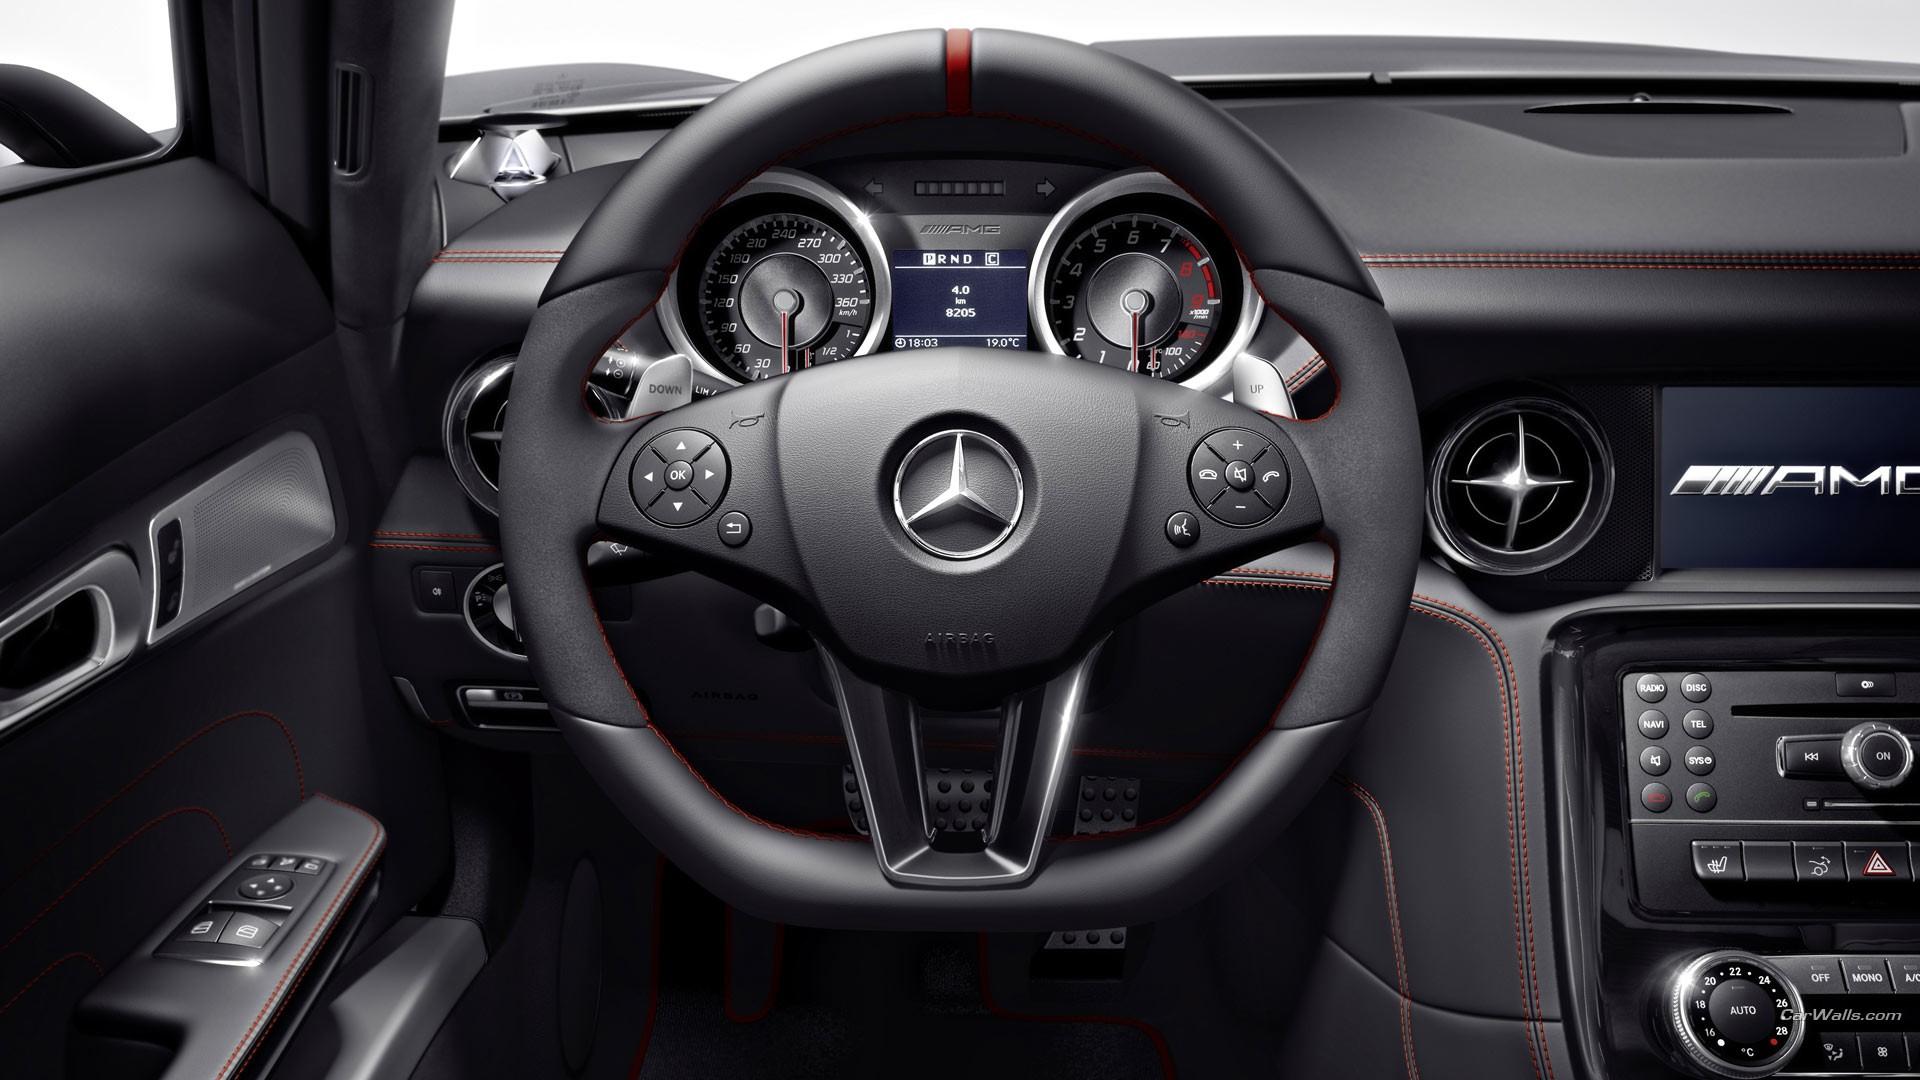 hintergrundbilder fahrzeug auto innenraum mercedes benz cockpit lenkrad limousine. Black Bedroom Furniture Sets. Home Design Ideas